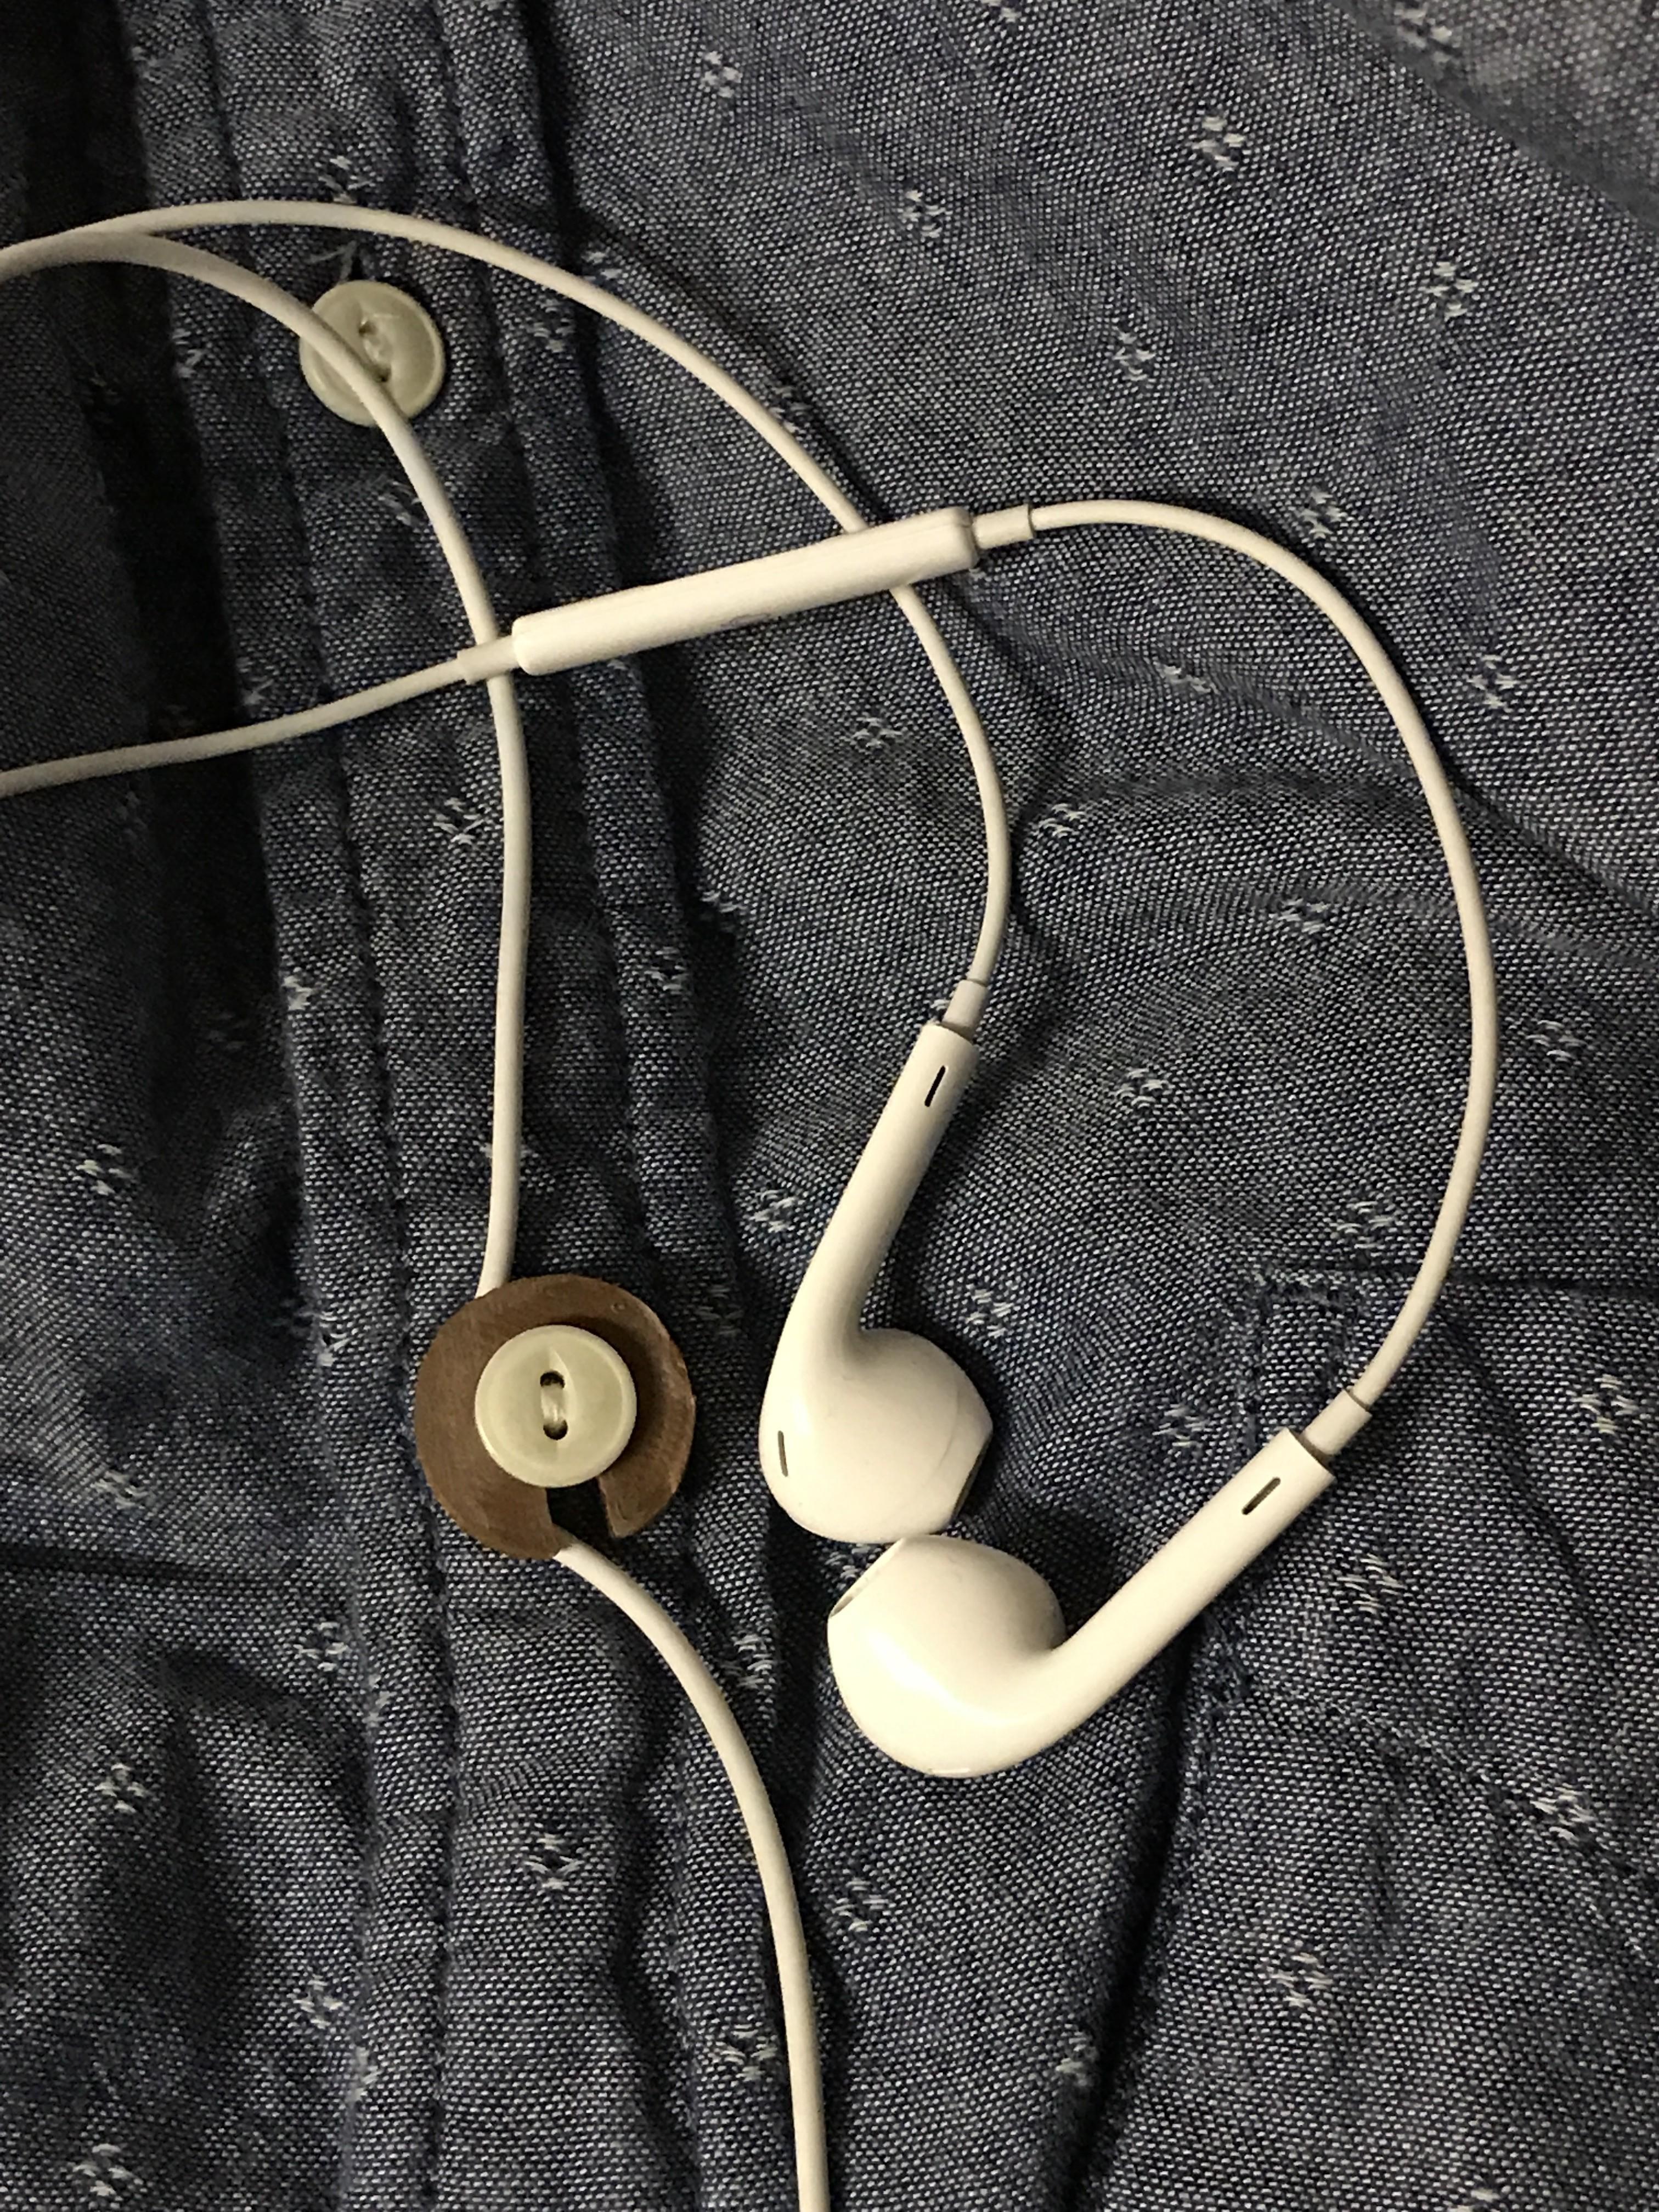 90D75965-5A25-4AE9-84A4-AAF2860544B0.jpeg Download free STL file Headphone management - button attachment • 3D printing design, AnthonyVanVolkinburg